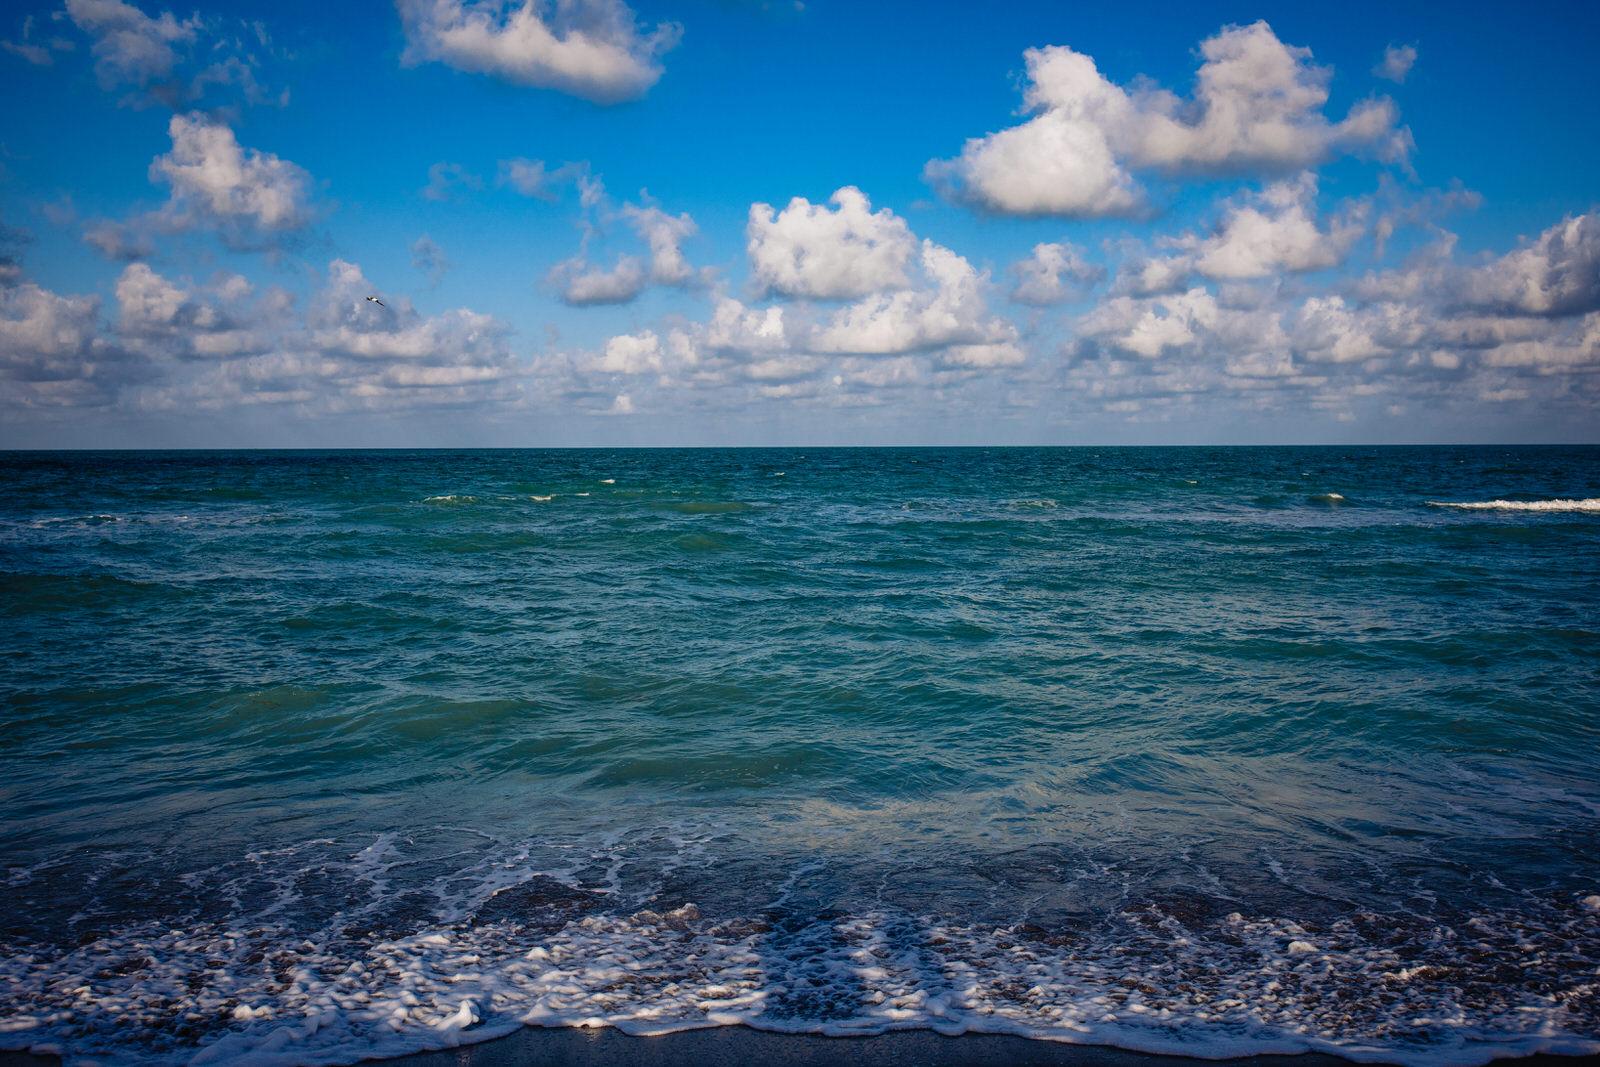 siesta-key-florida-tiny-house-photo-vacation-beach-nature-macro-15.jpg